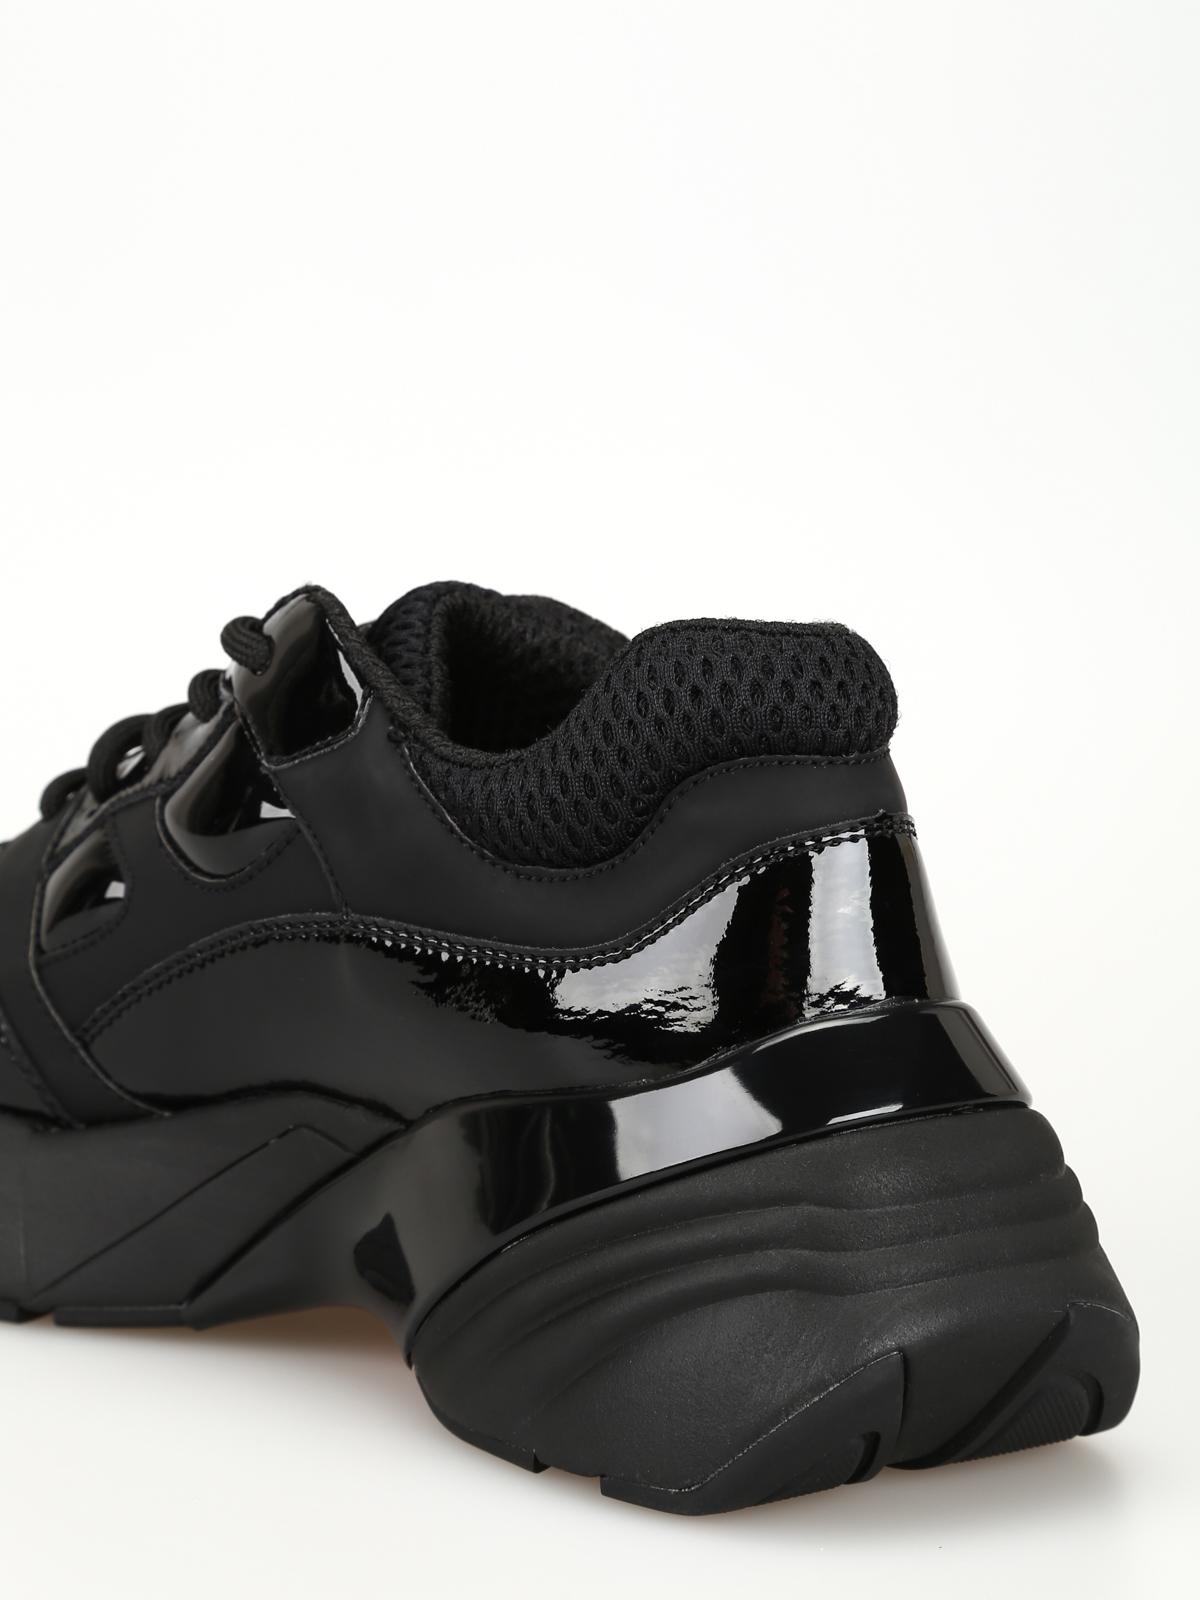 buy online 17e2c d201a Pinko - Sneaker Rubino nere - sneakers - 1H20LSY5BPZ99 ...